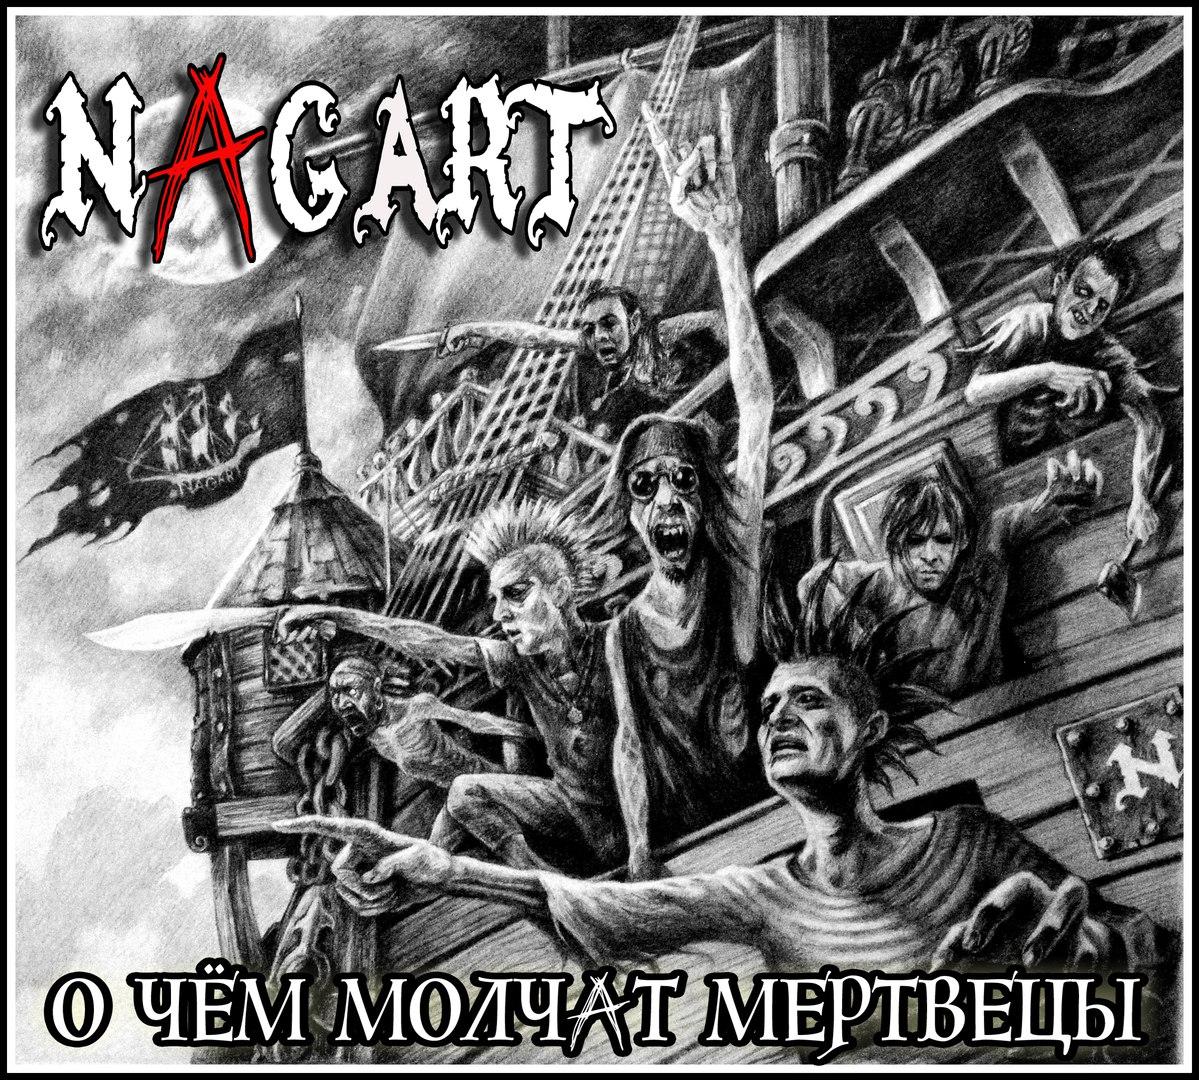 Nagart - О чём молчат мертвецы